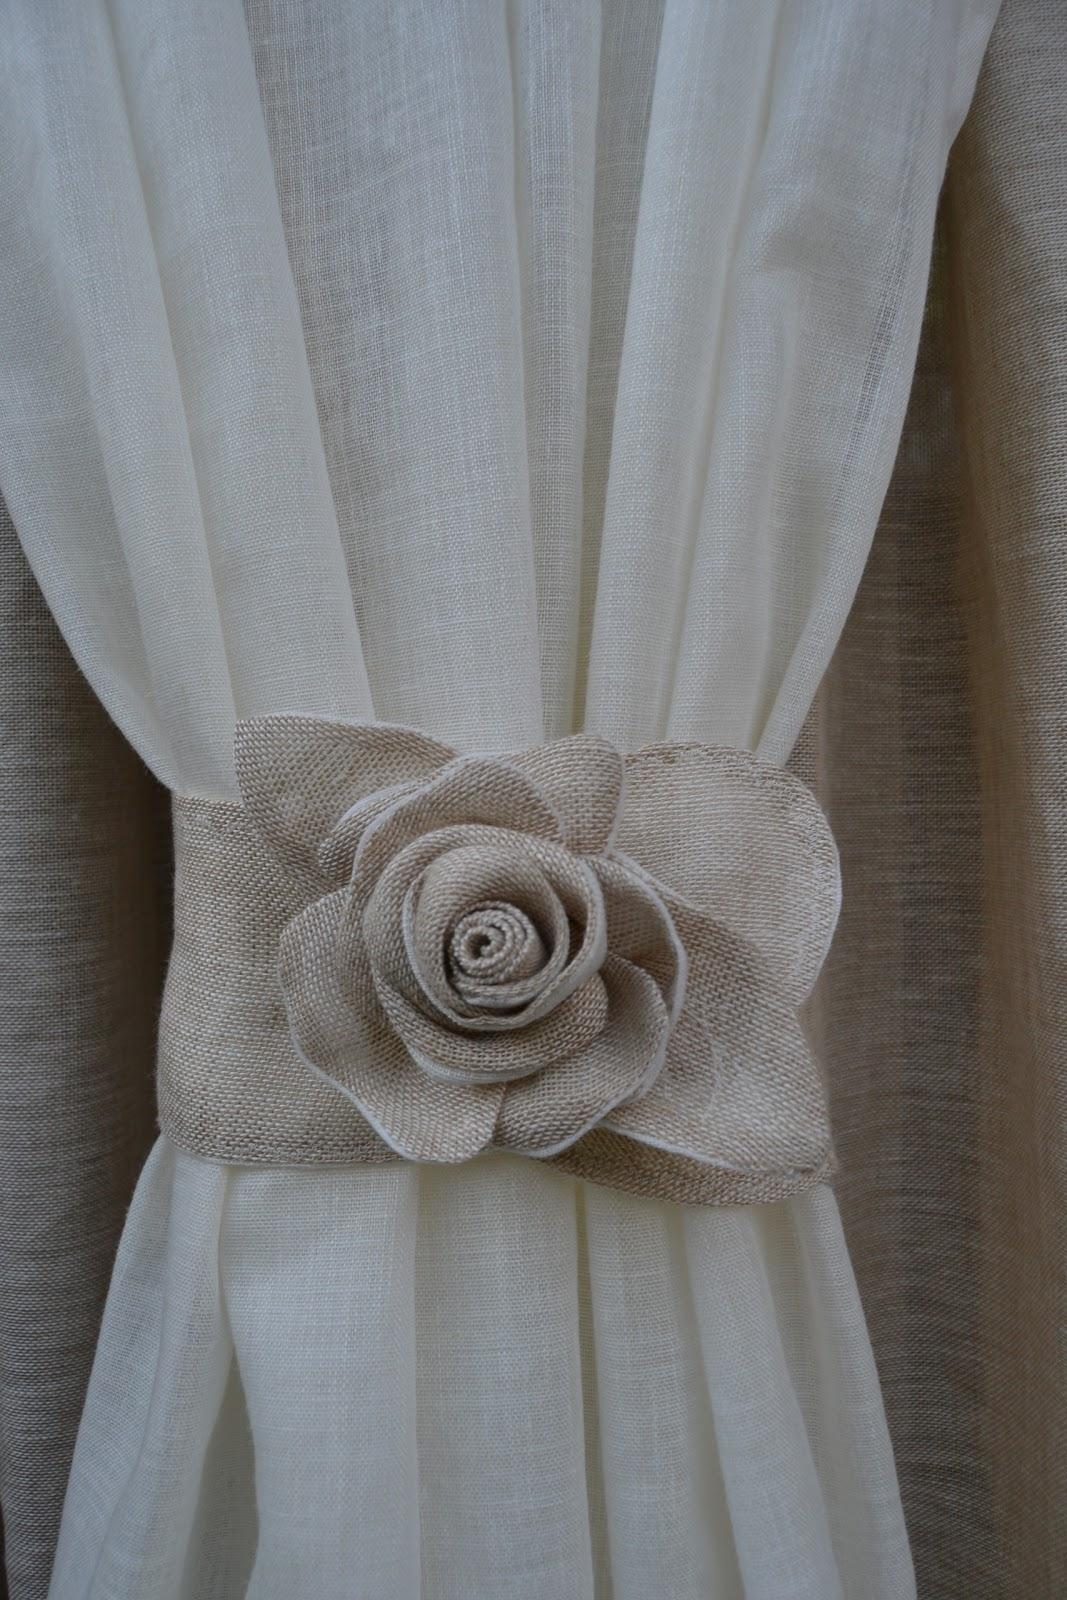 Rosa per tende in lino - Tende in lino per cucina ...